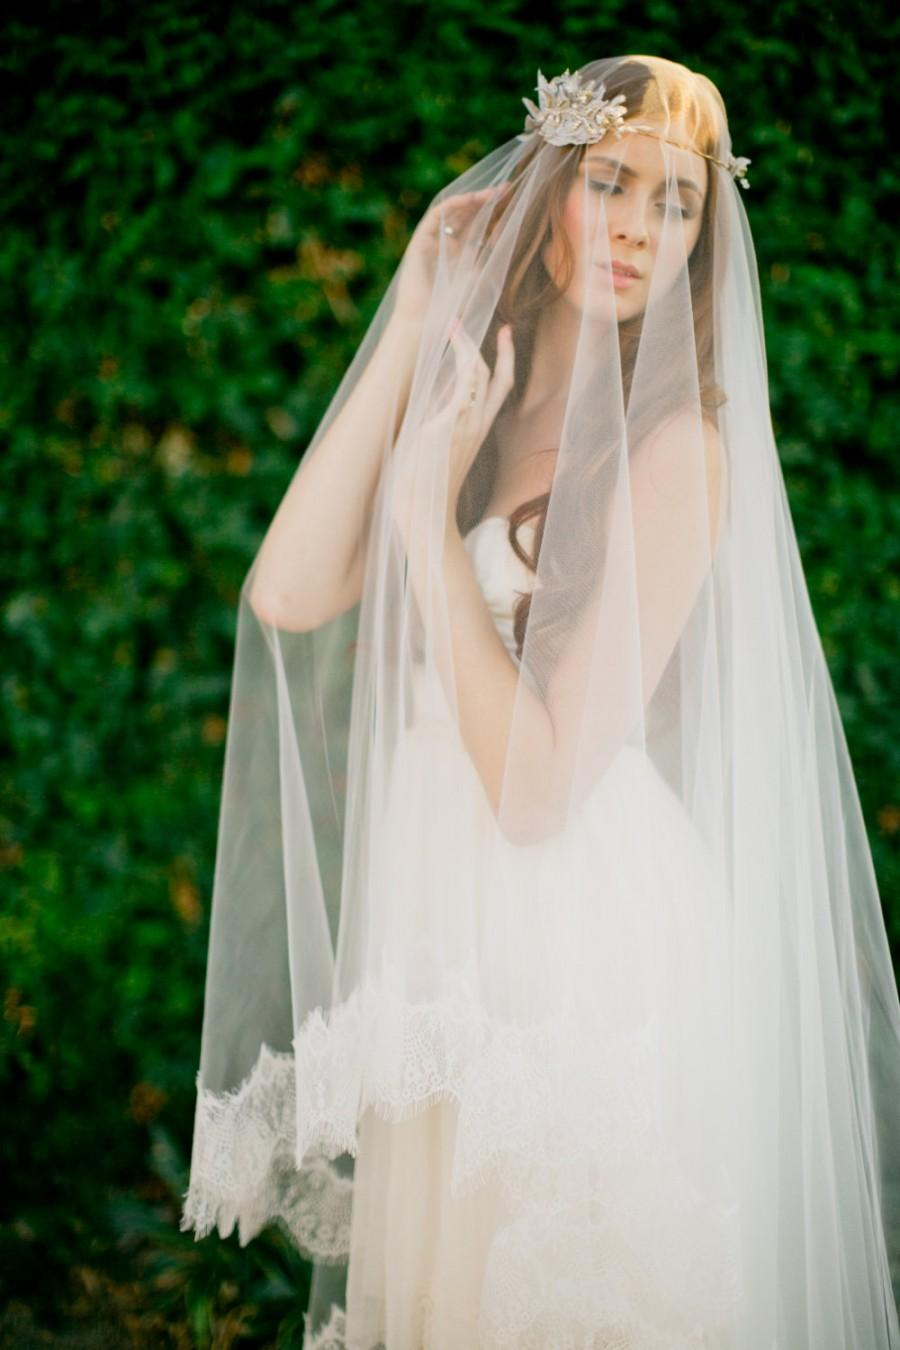 Wedding - Bridal veil- double layer veil- fingertip veil-drop veil-wedding veil- waltz veil- circle blusher veil- cathedral veil-style 100